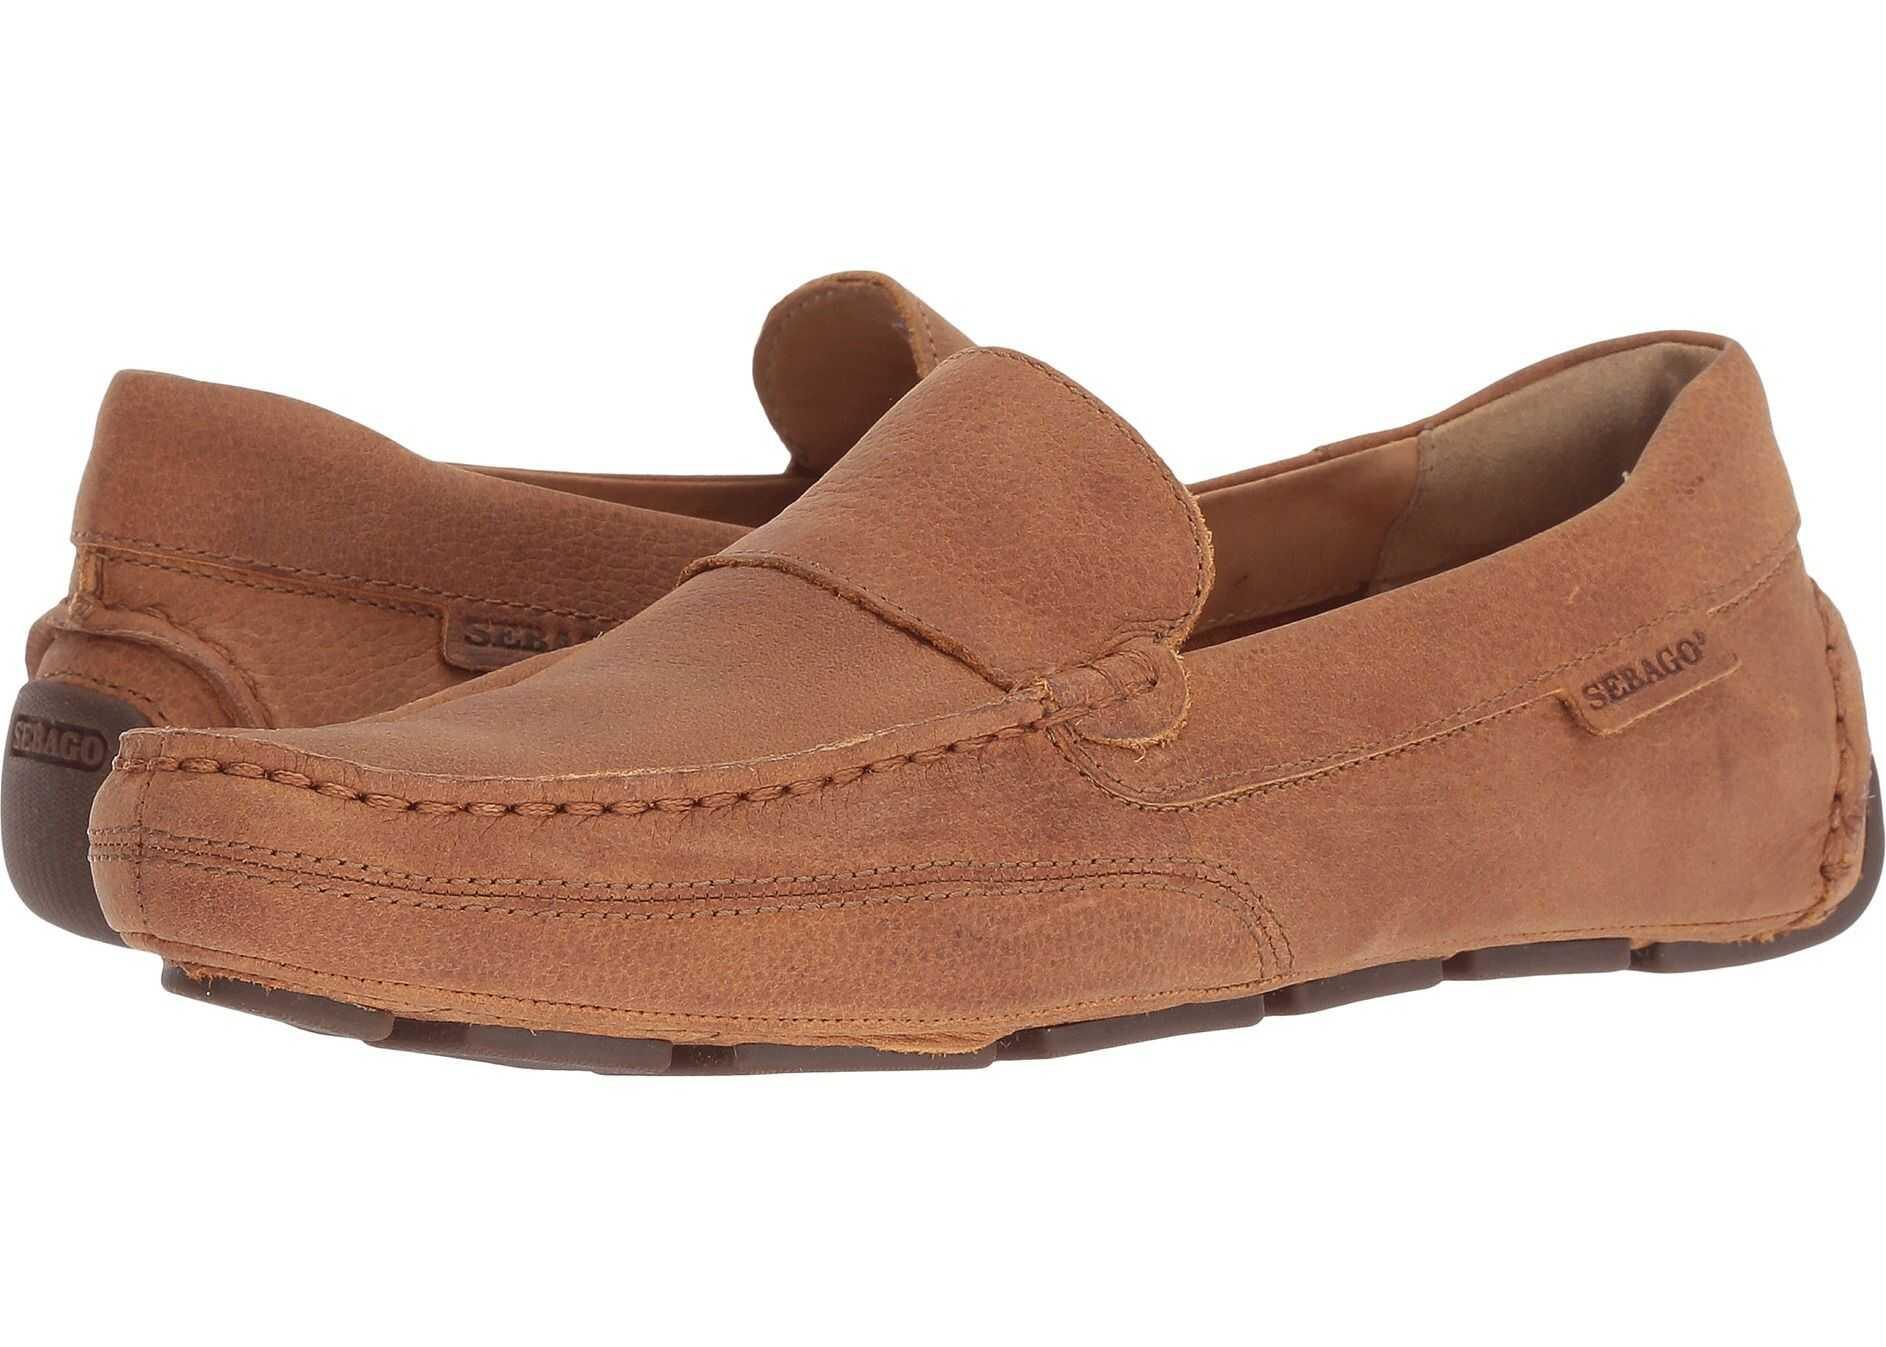 Sebago Kedge Venetian Tan Leather